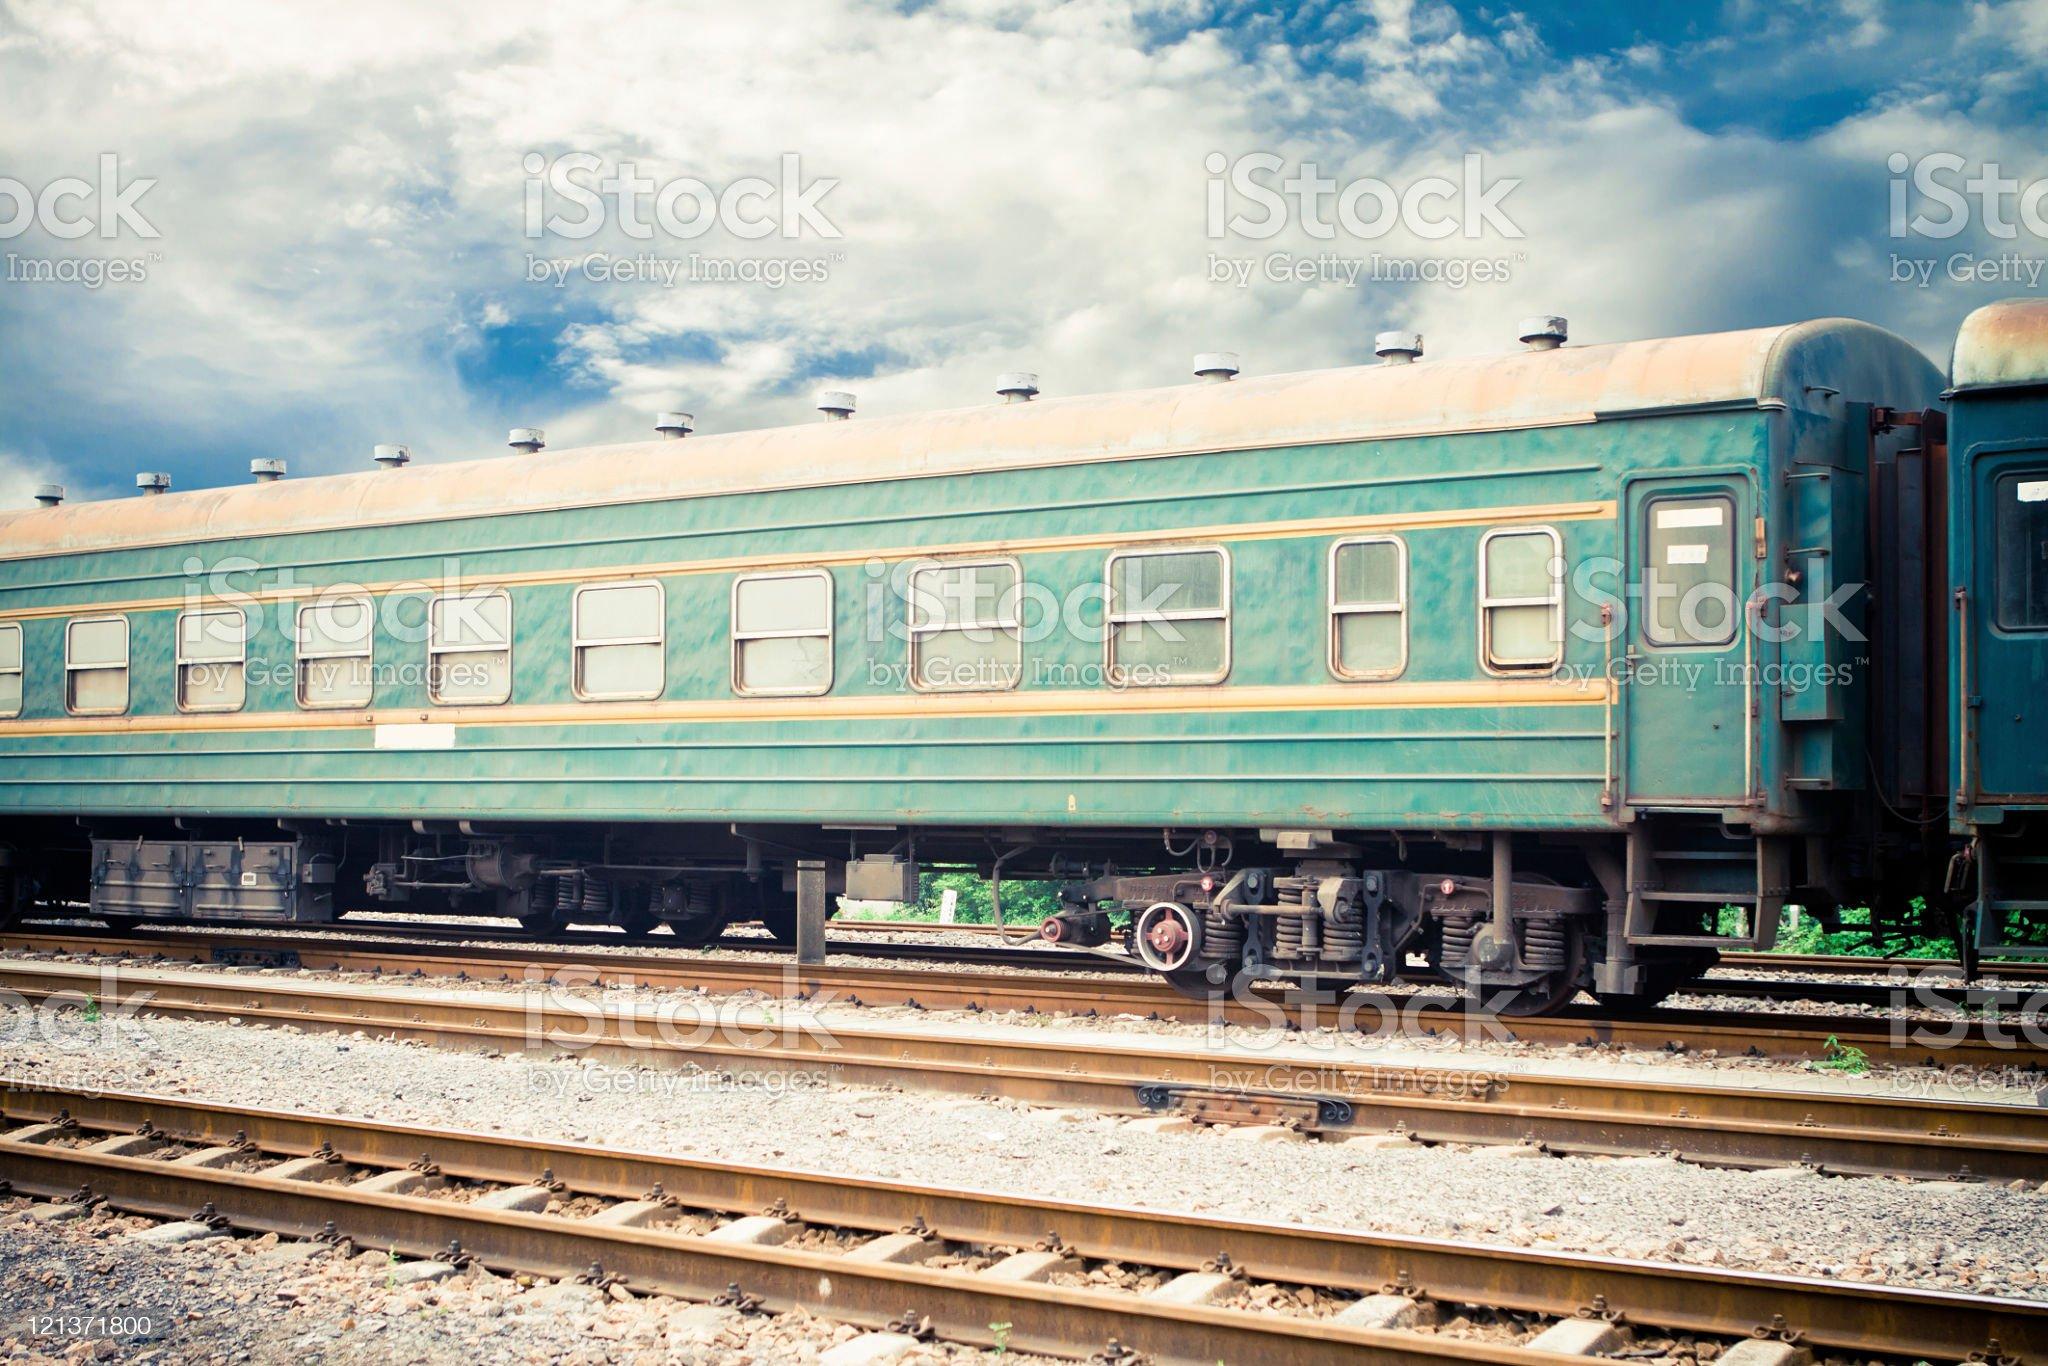 train on railway tracks royalty-free stock photo